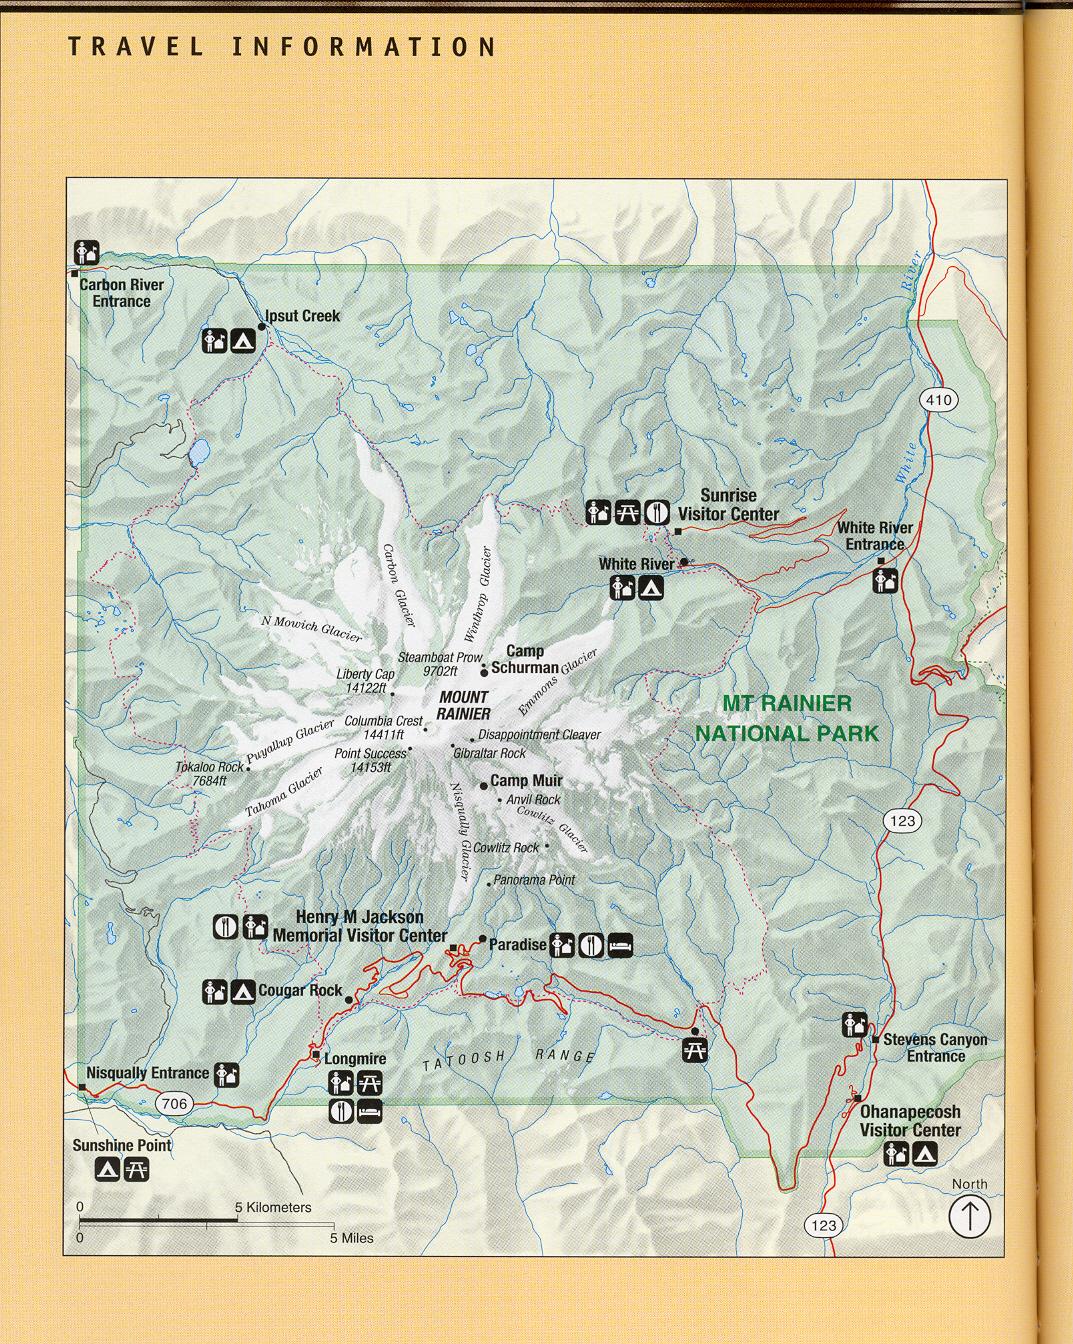 Mount Rainier National Park Map Mount Rainier WA US Mappery - Map of us mount ranier